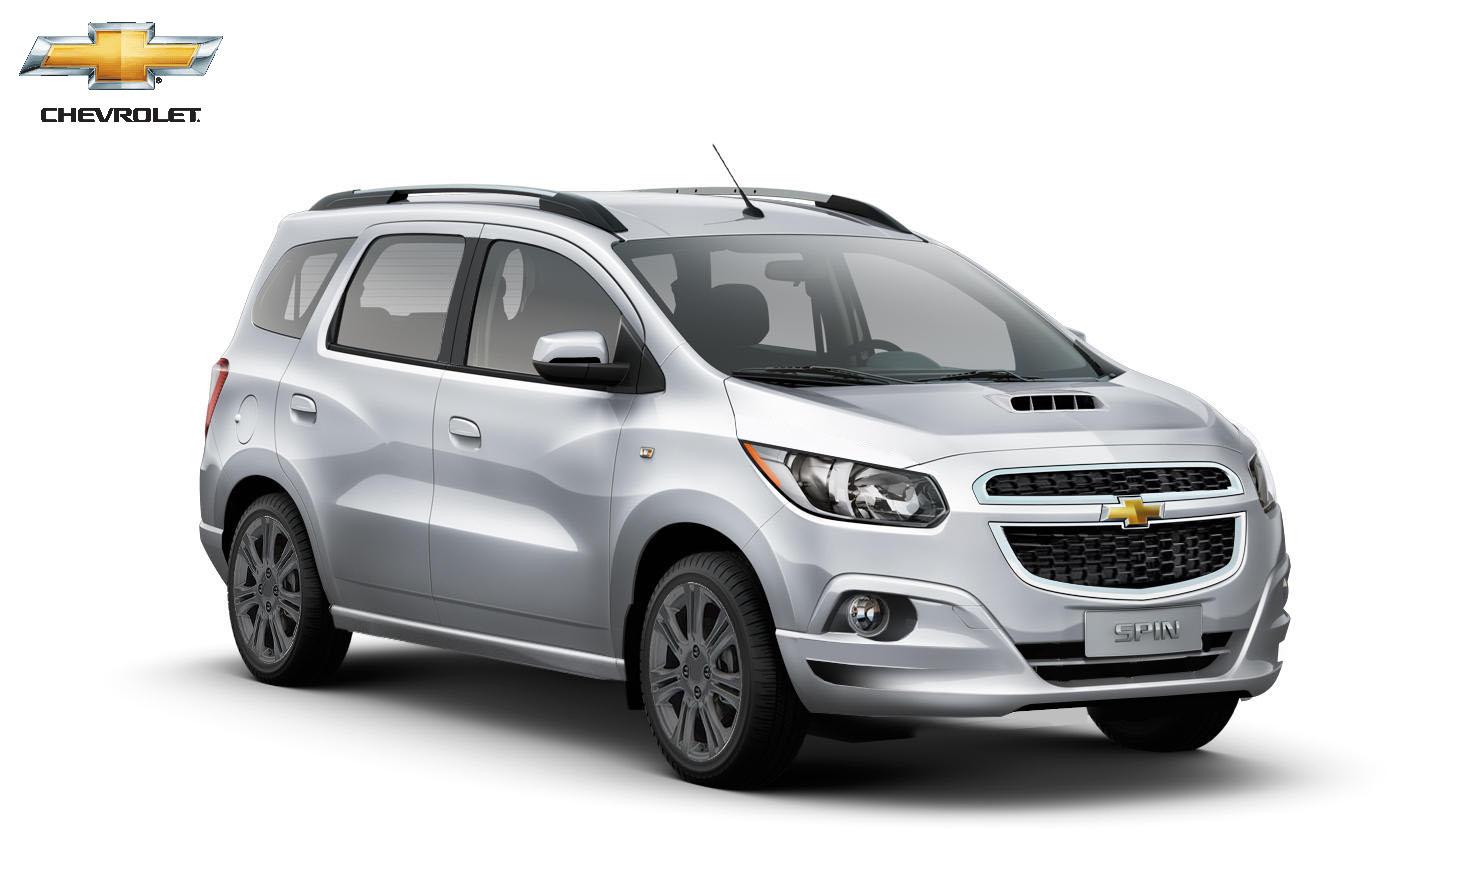 Konsumsi Bbm Grand New Veloz 1.5 Avanza 2015 Type E All About Chevrolet Spin Dirakit Di Indonesia Andra